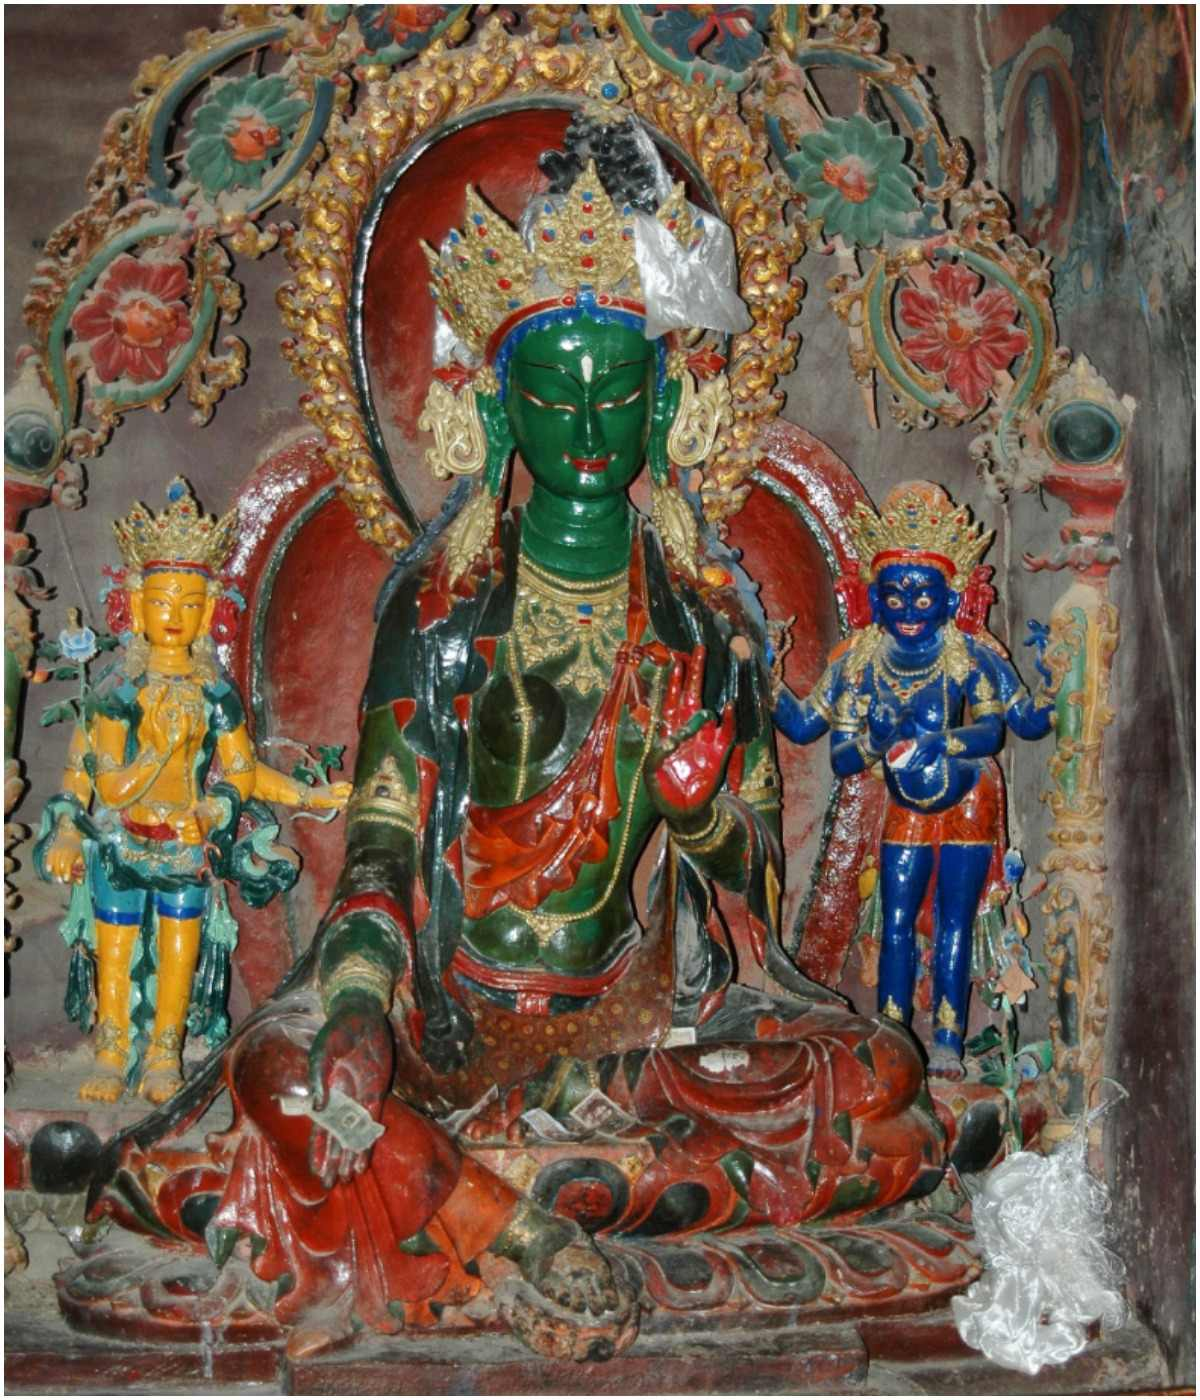 sacred statue of Green Tara in a Tibetan monastery